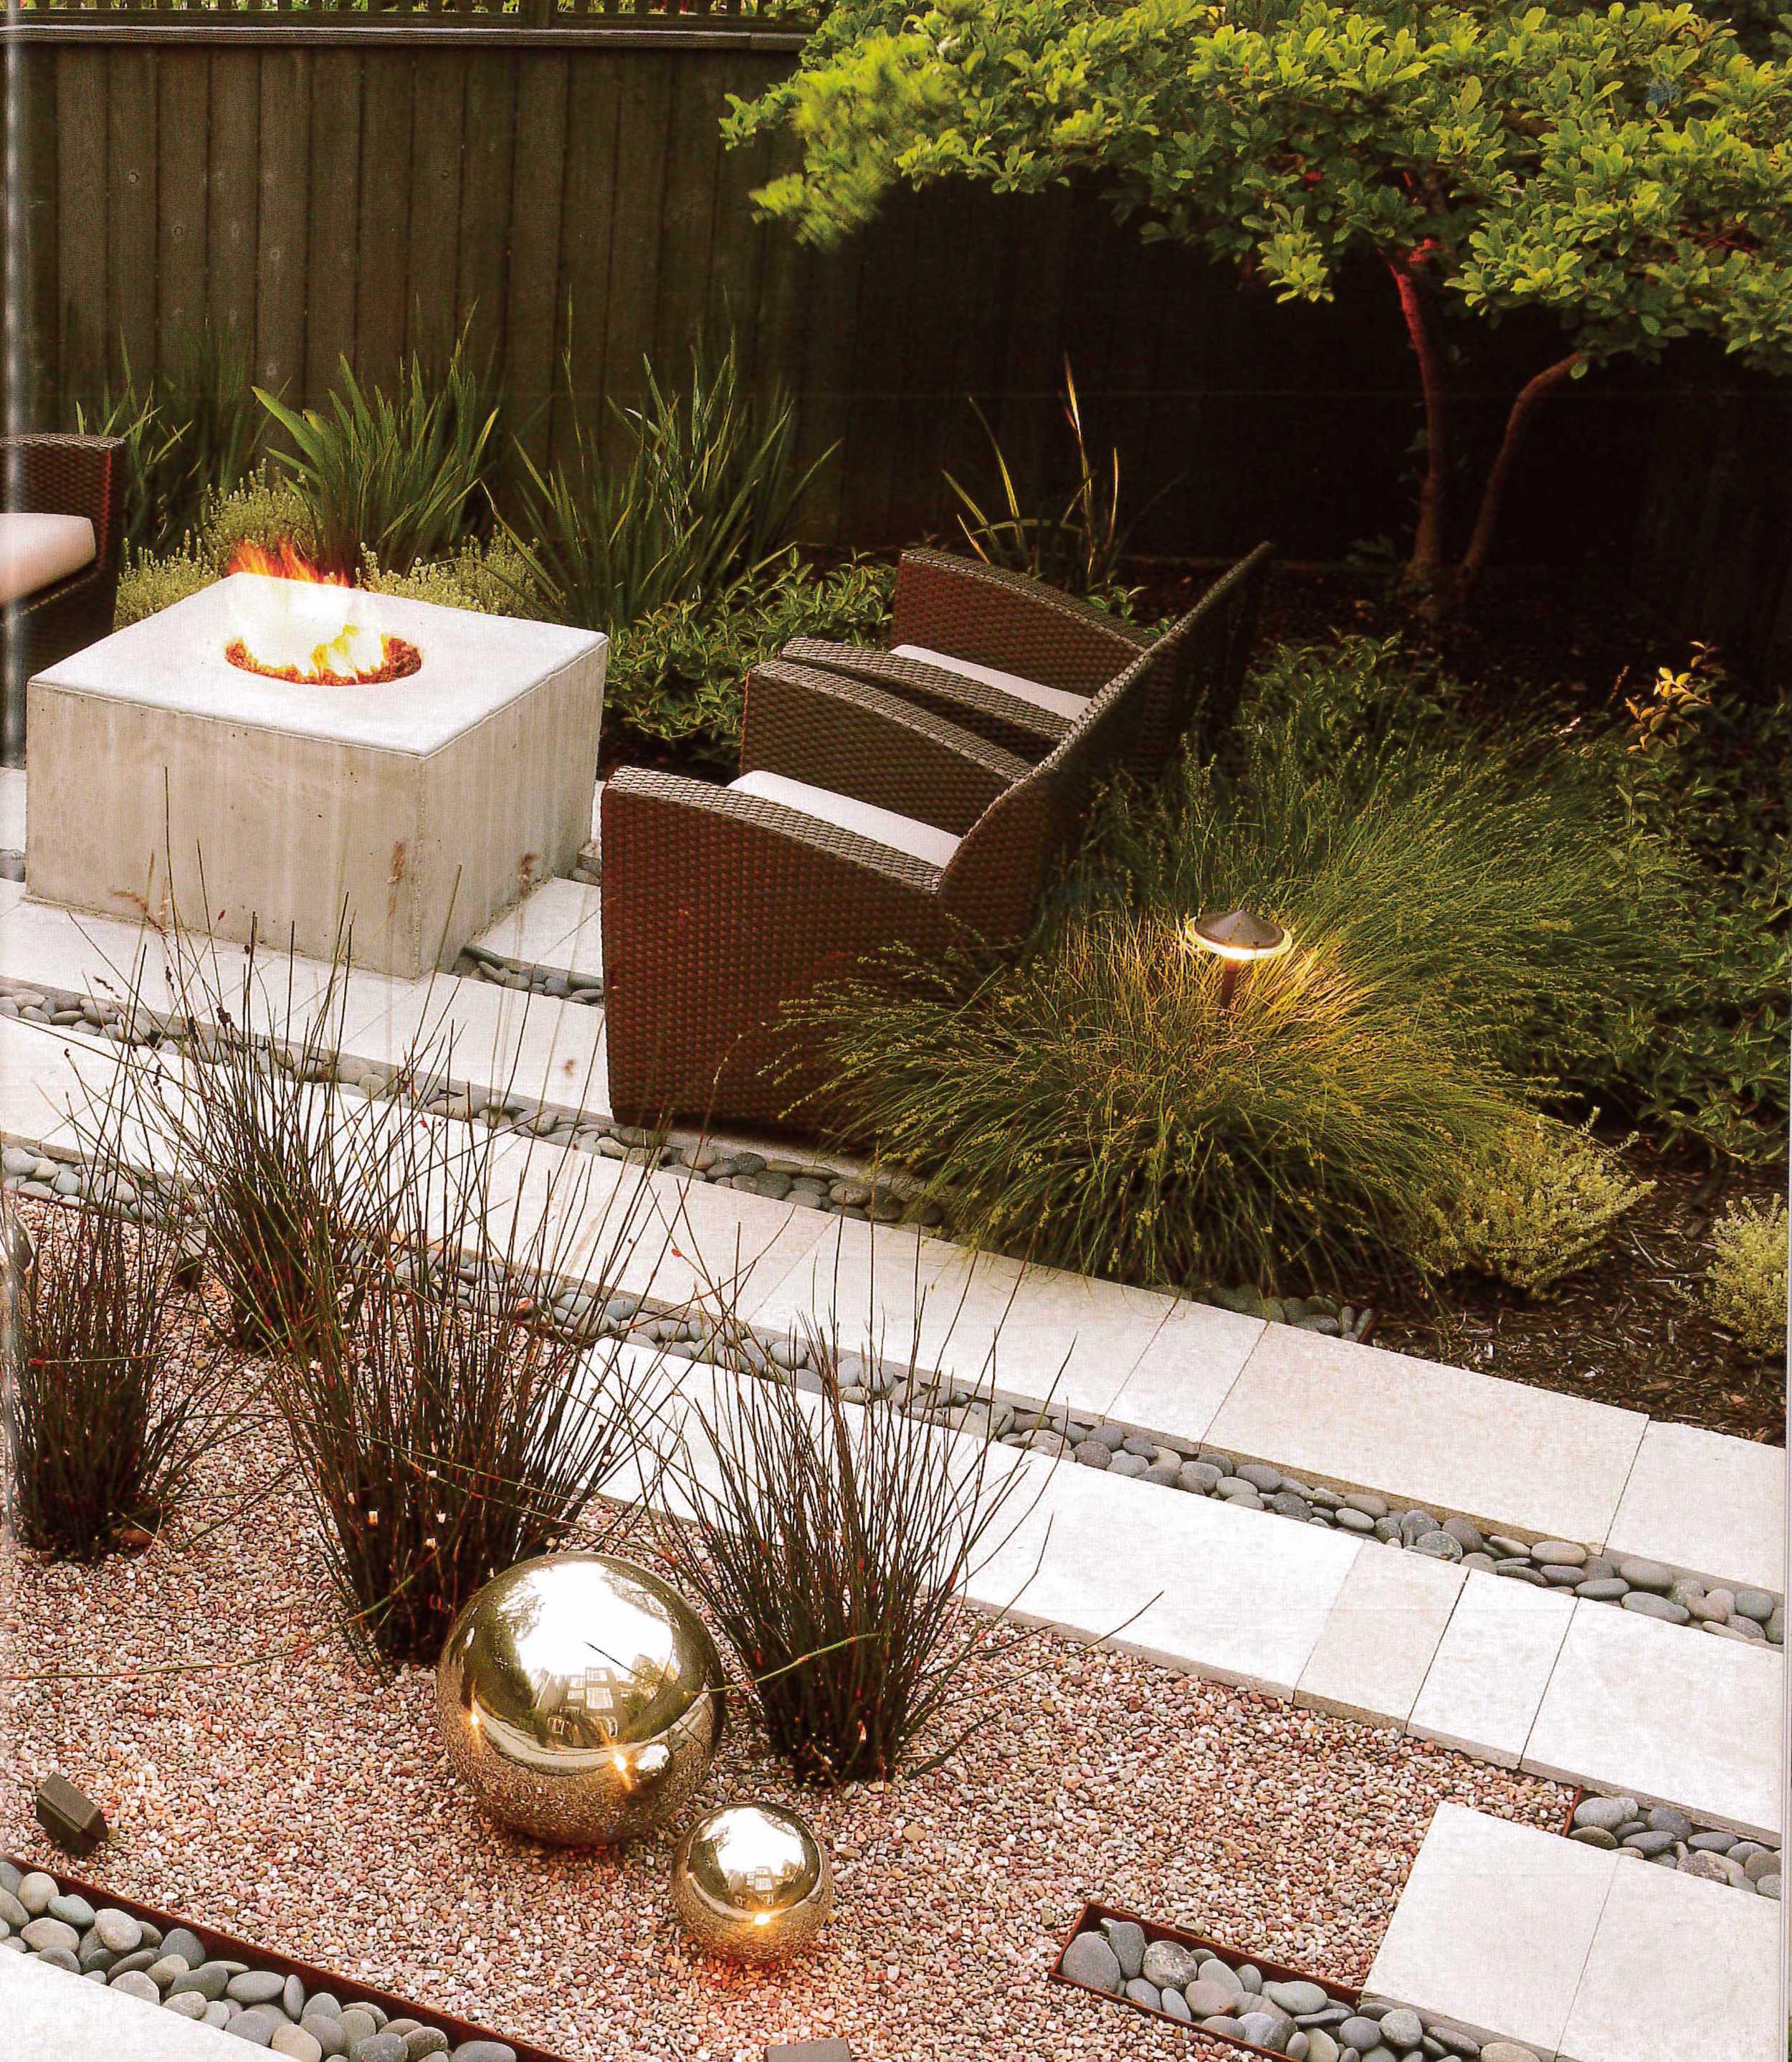 436c2-garden-within-walls_pg02.jpg